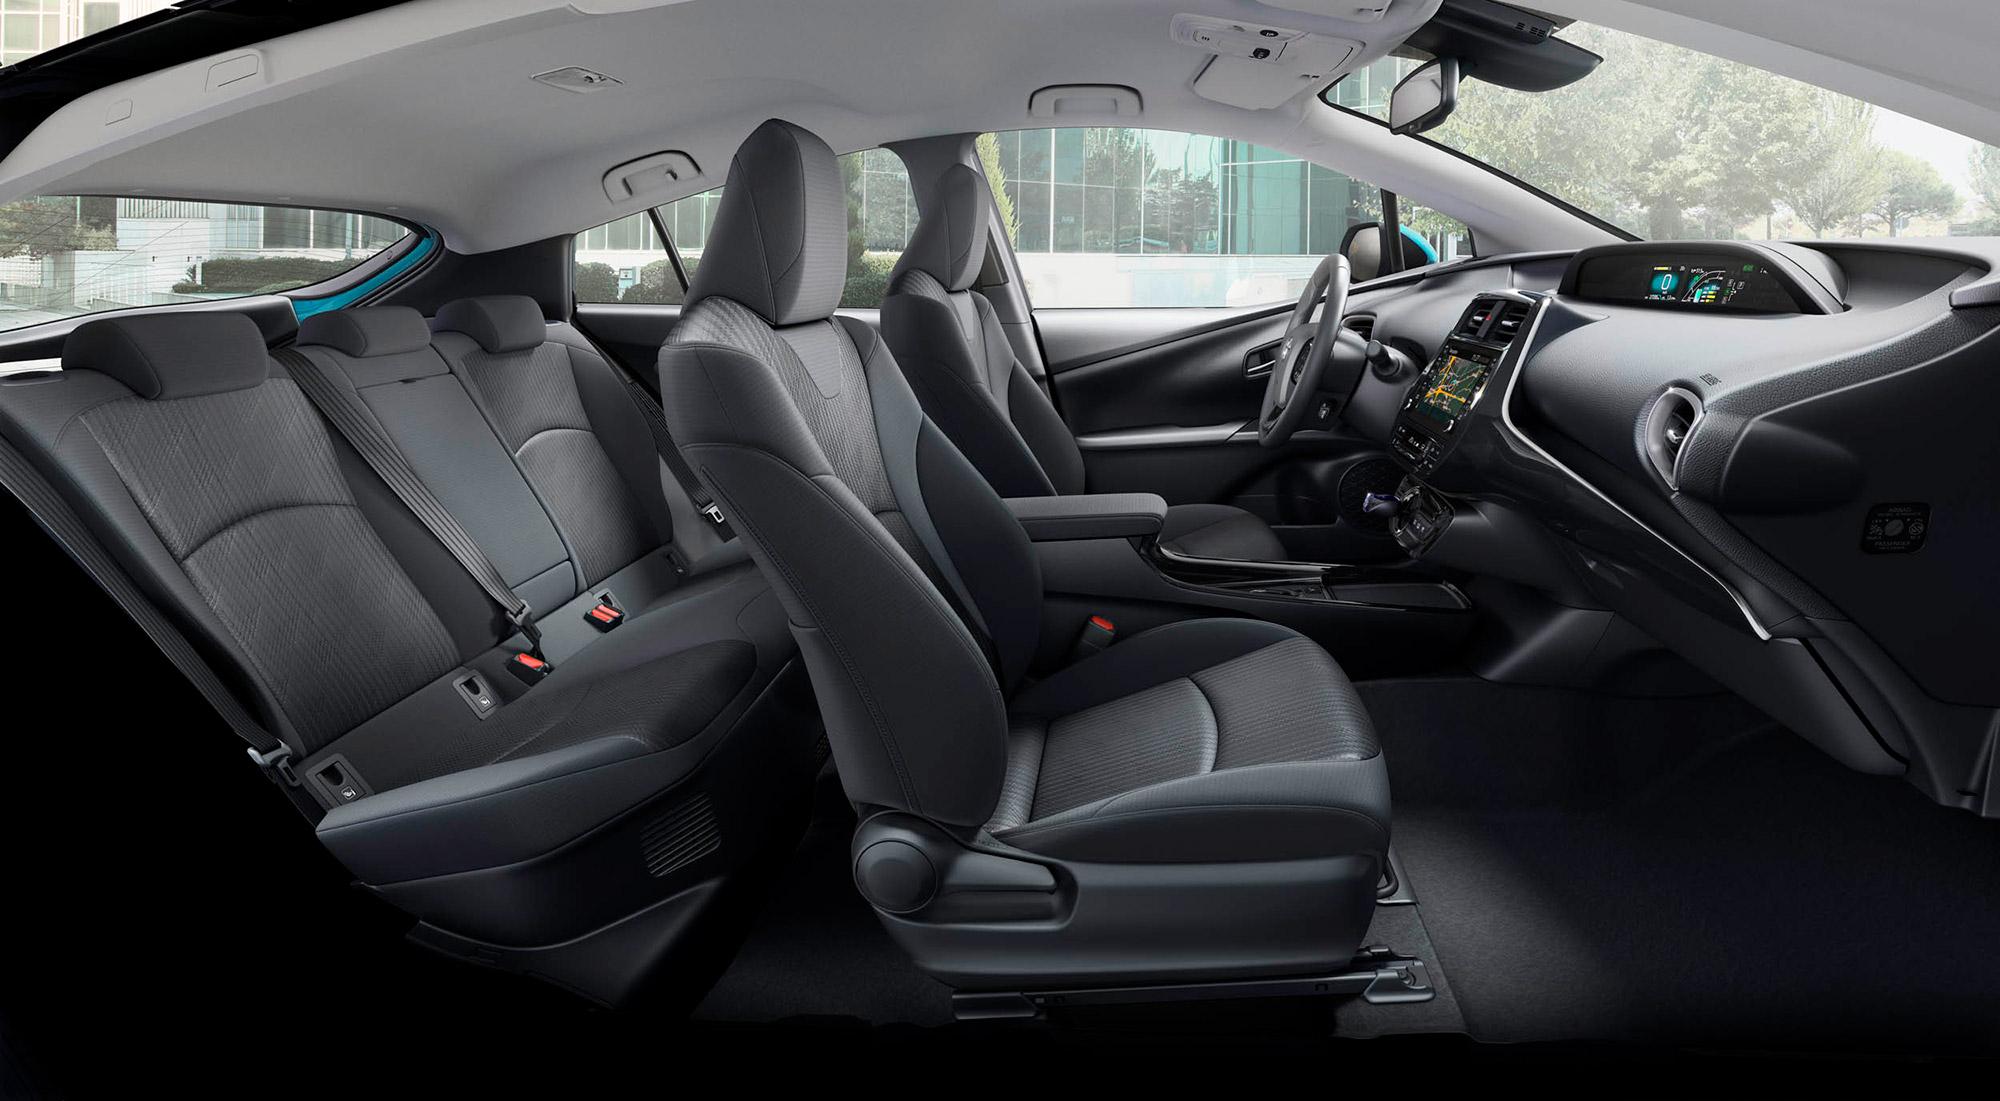 2019-toyota-prius-plug-in-hybrid.jpg